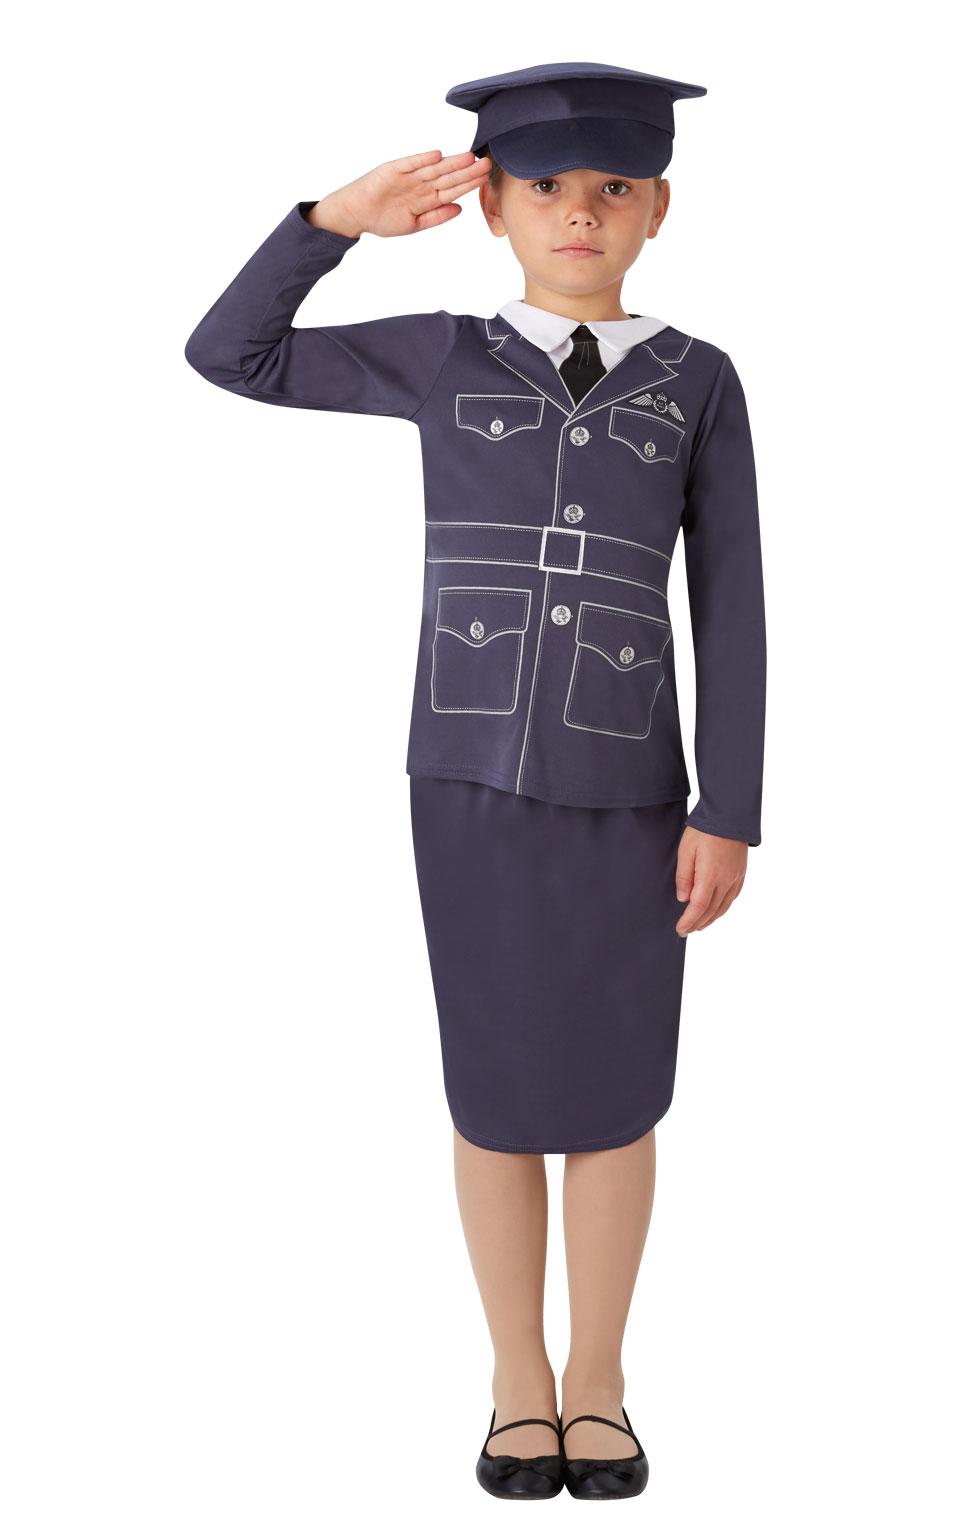 Details about GirlS Kids Fancy Dress Raf Pilot Uniform Ww2 1940S Childs  Costume Childrens 5-6